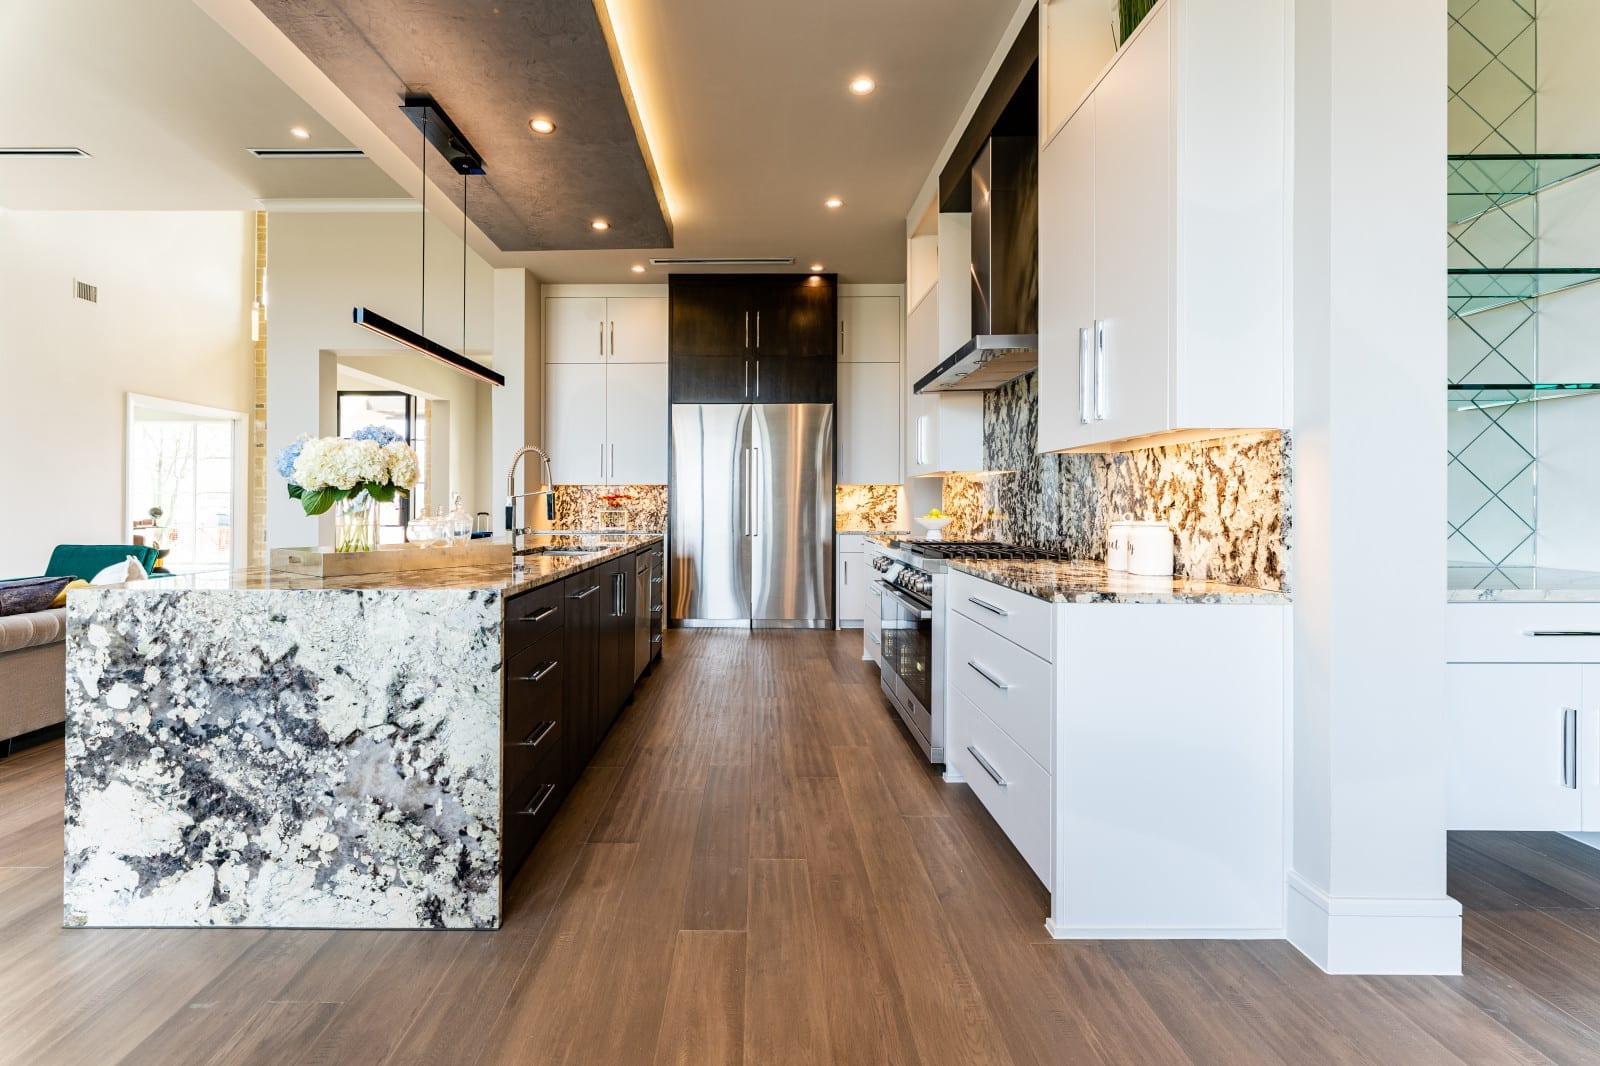 Modern Style Homes design # 13 - Millennial Design + Build